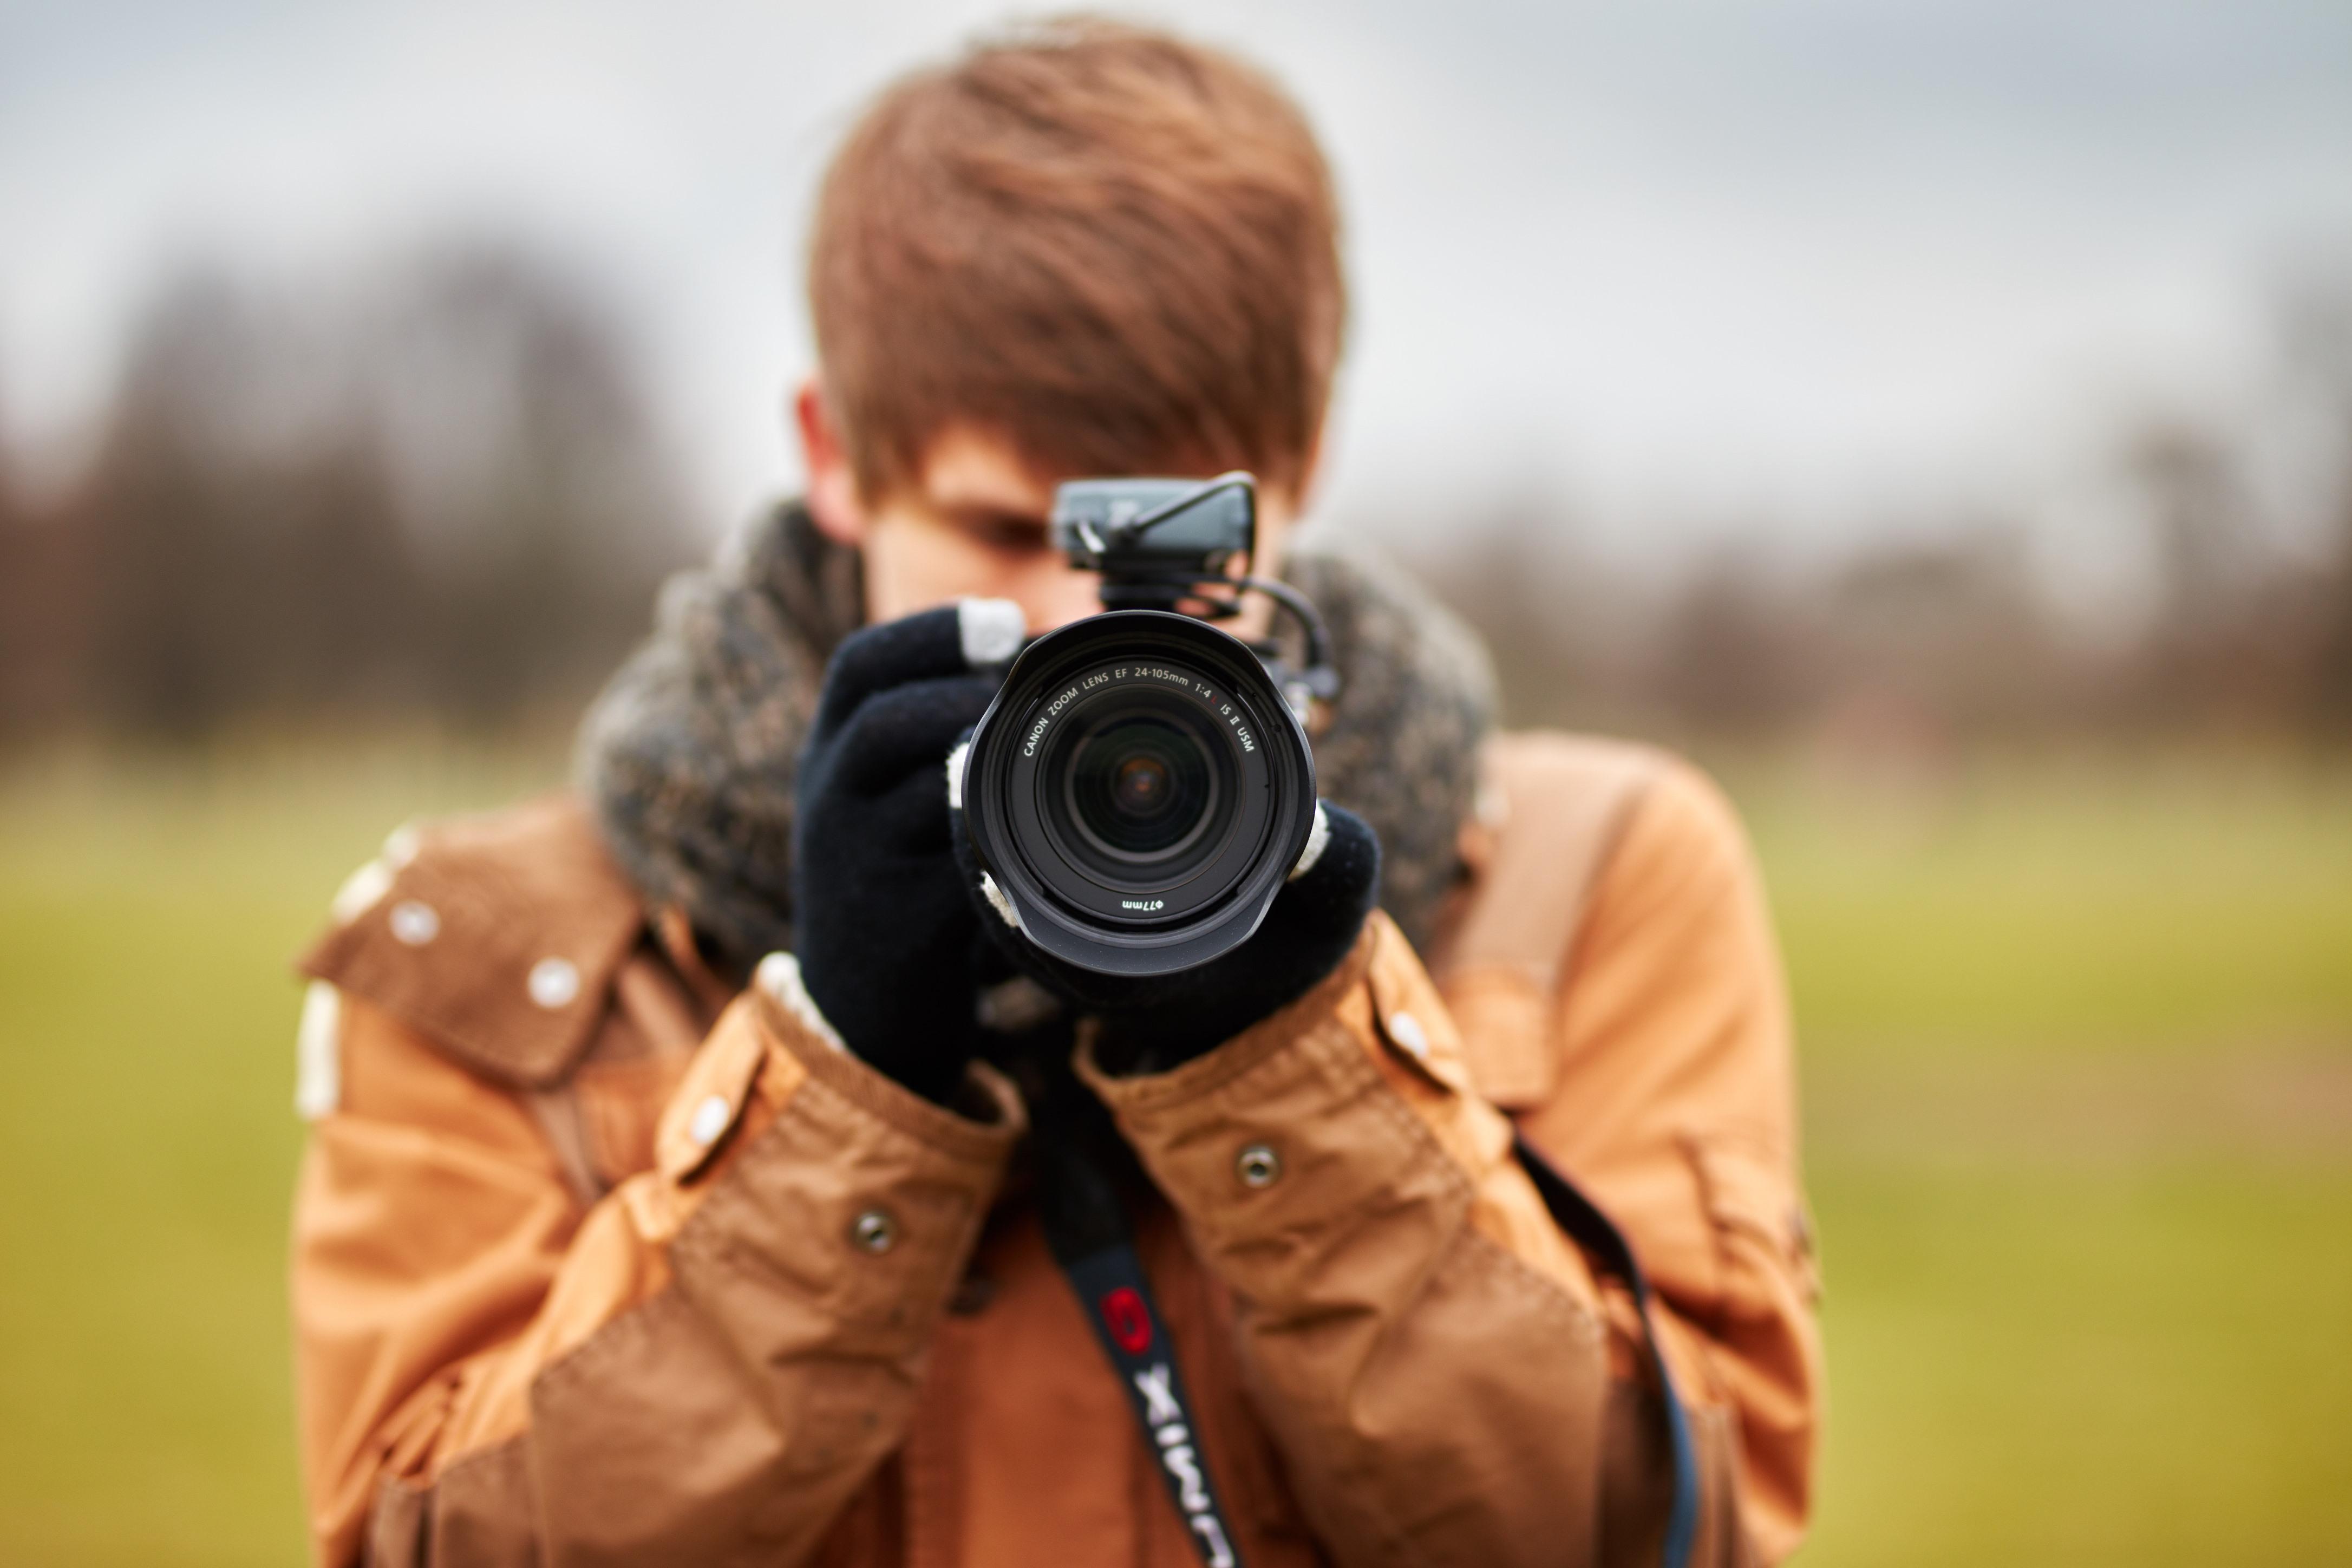 Sigma A 85 Mm F14 Dg Hsm Das Beinahe Perfekte Portrait 105mm Art Lens For Canon Ef Eos 5ds R F 14 Iso 200 1 160 S